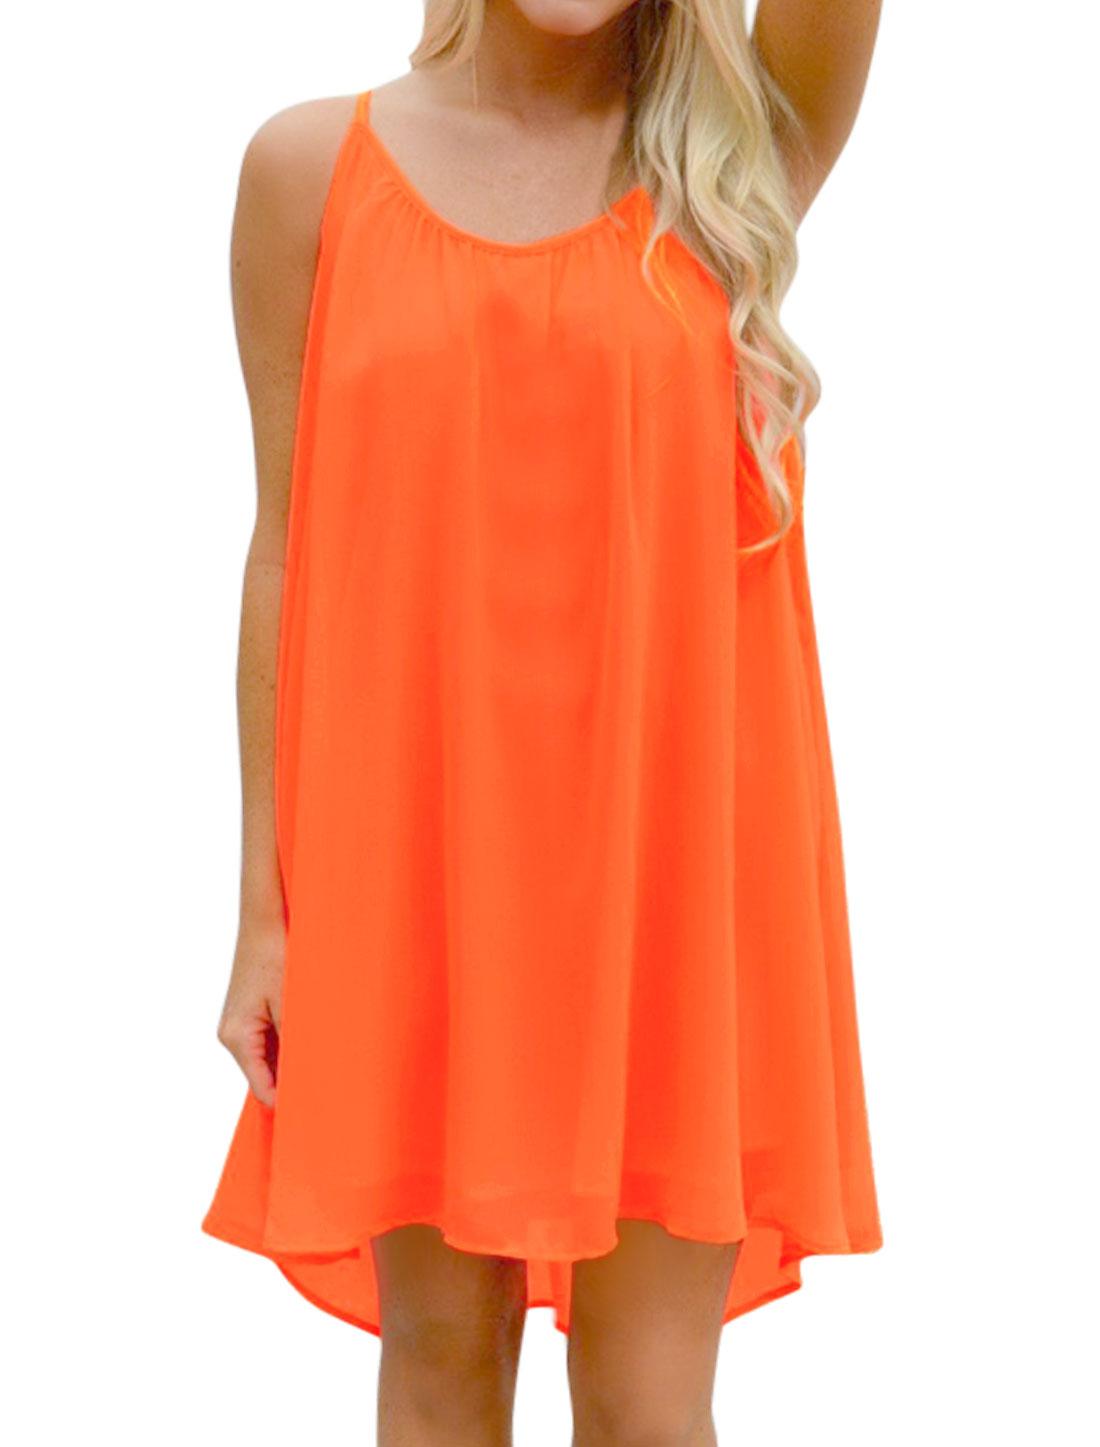 Women Spaghetti Straps Hollow Out Panel Back Loose Chiffon Dress Orange M